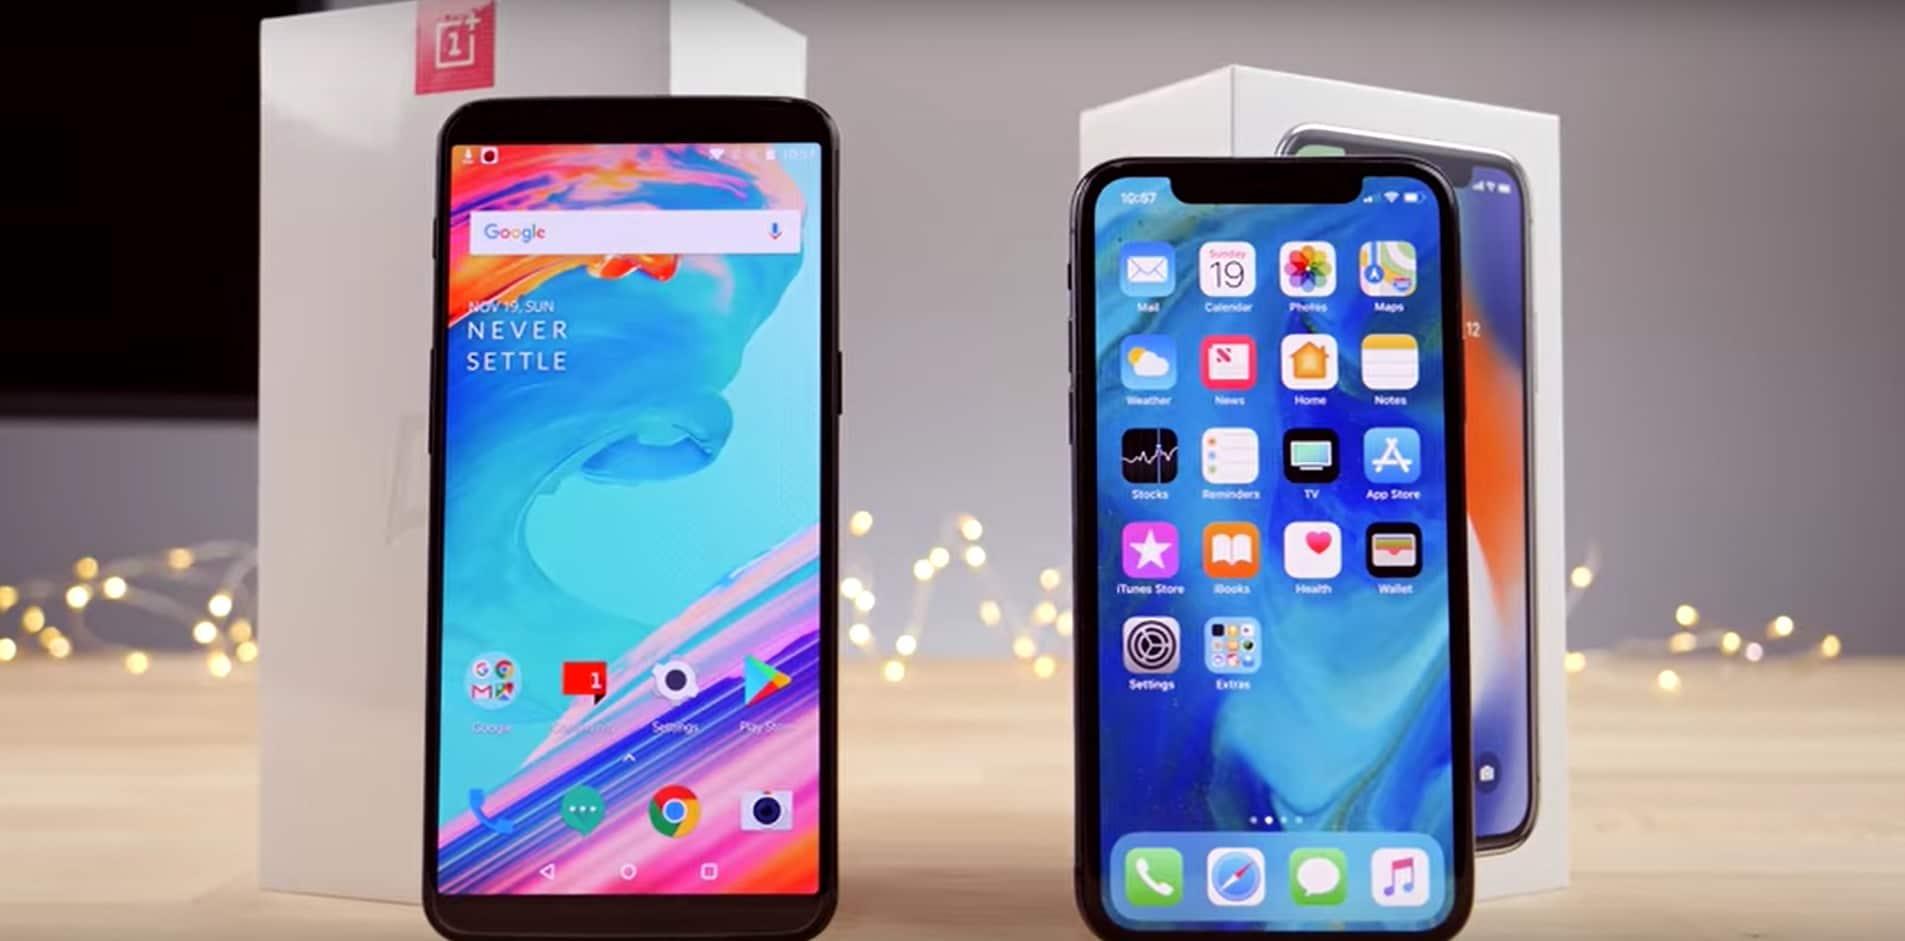 oneplus 5T vs iPhone X speed test